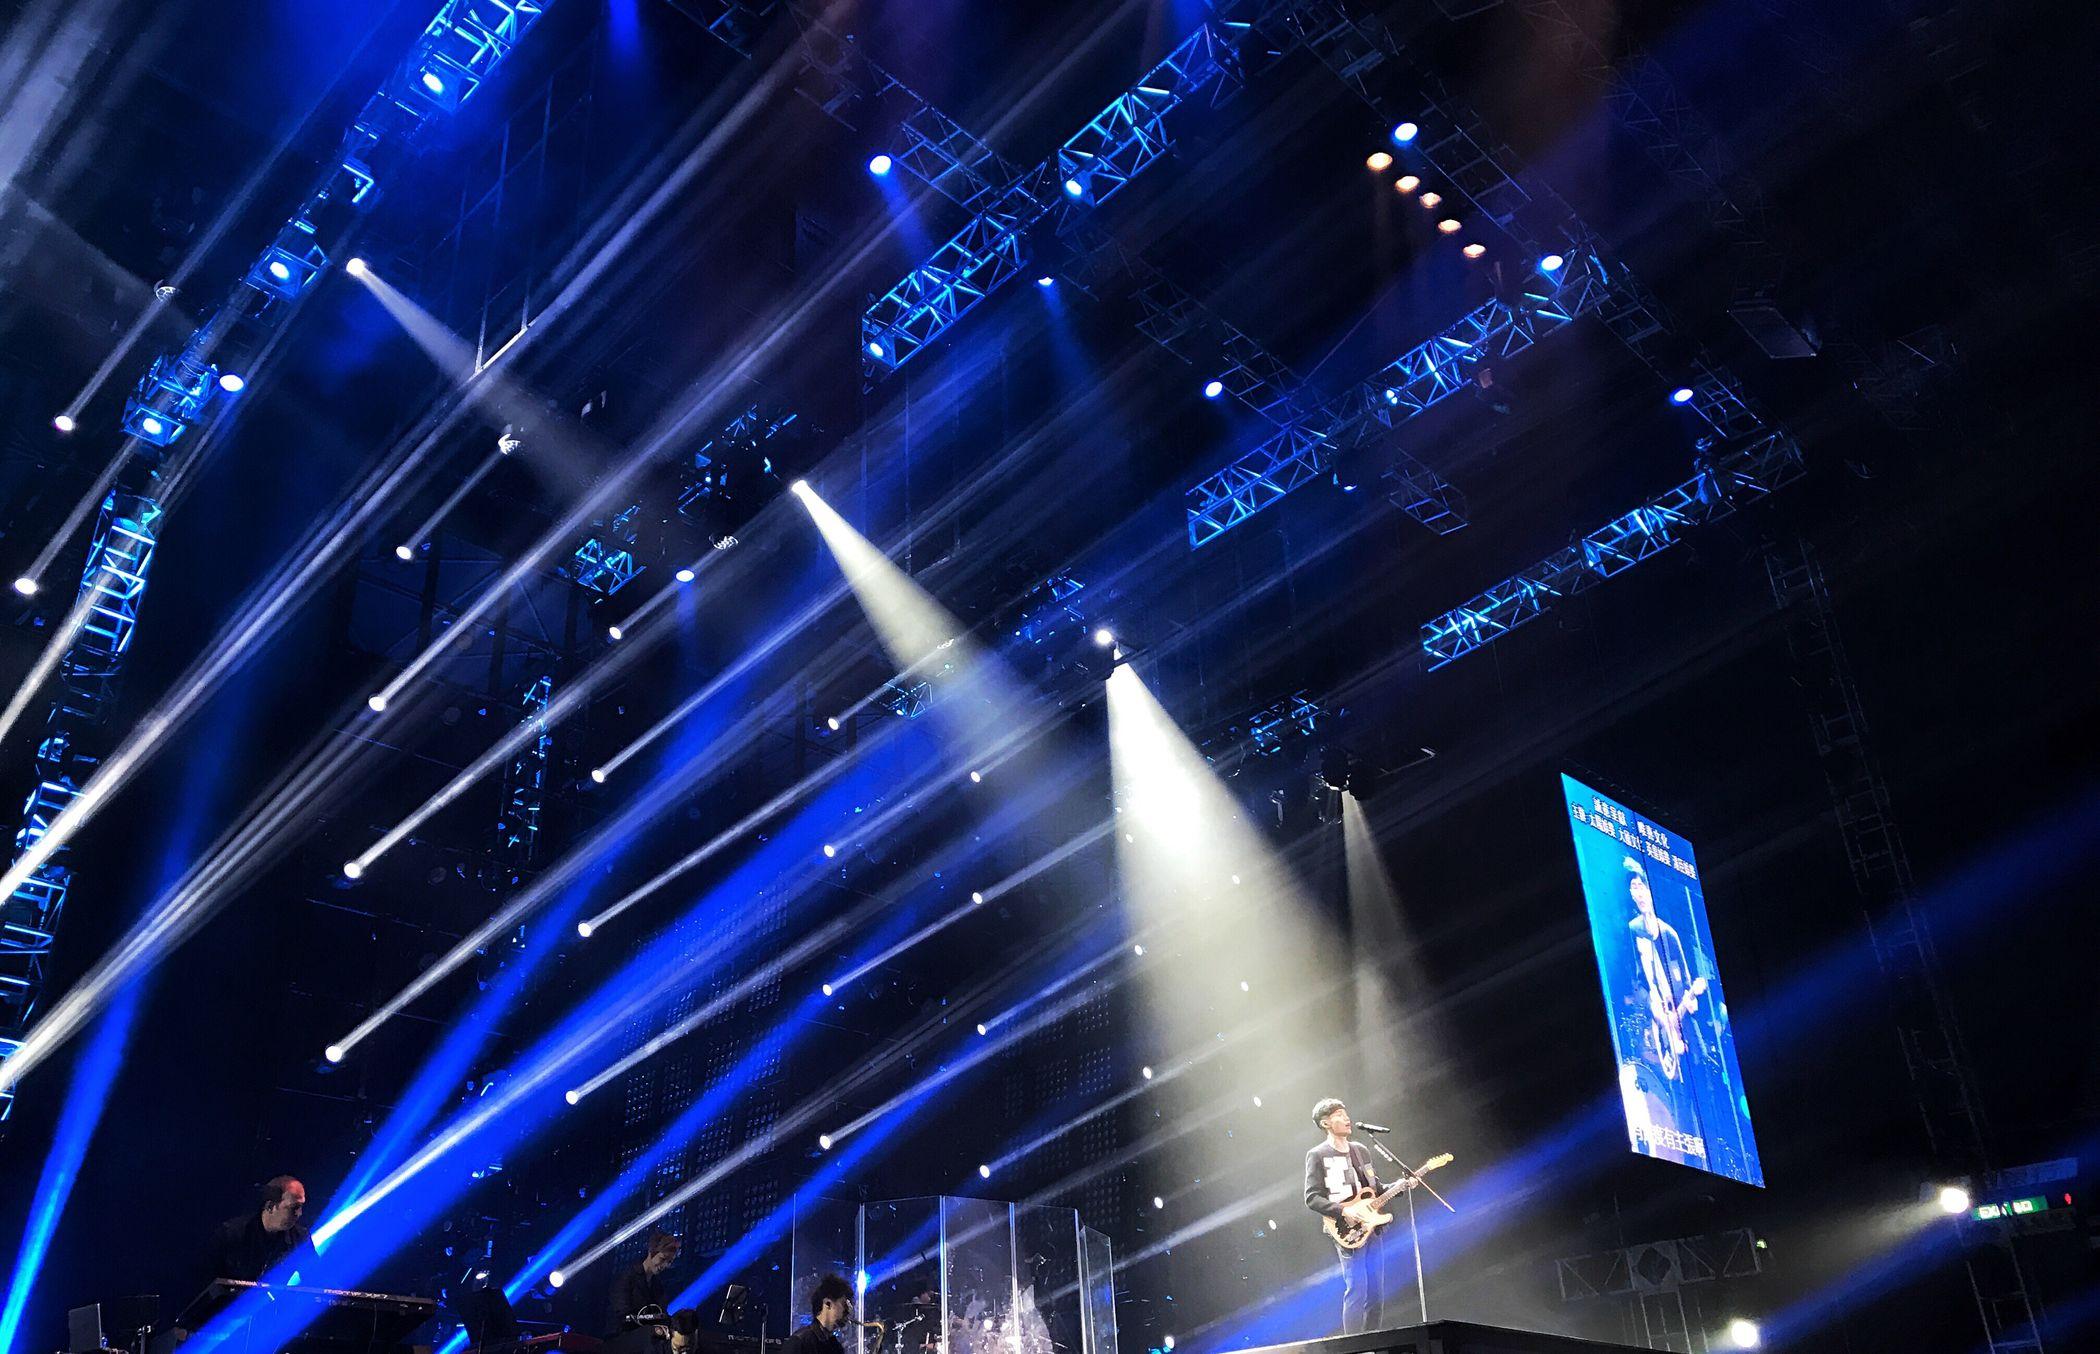 Night No People Illuminated Music Technology Performance Modern Nightlife Sound Mixer Indoor Hong Kong Coliseum